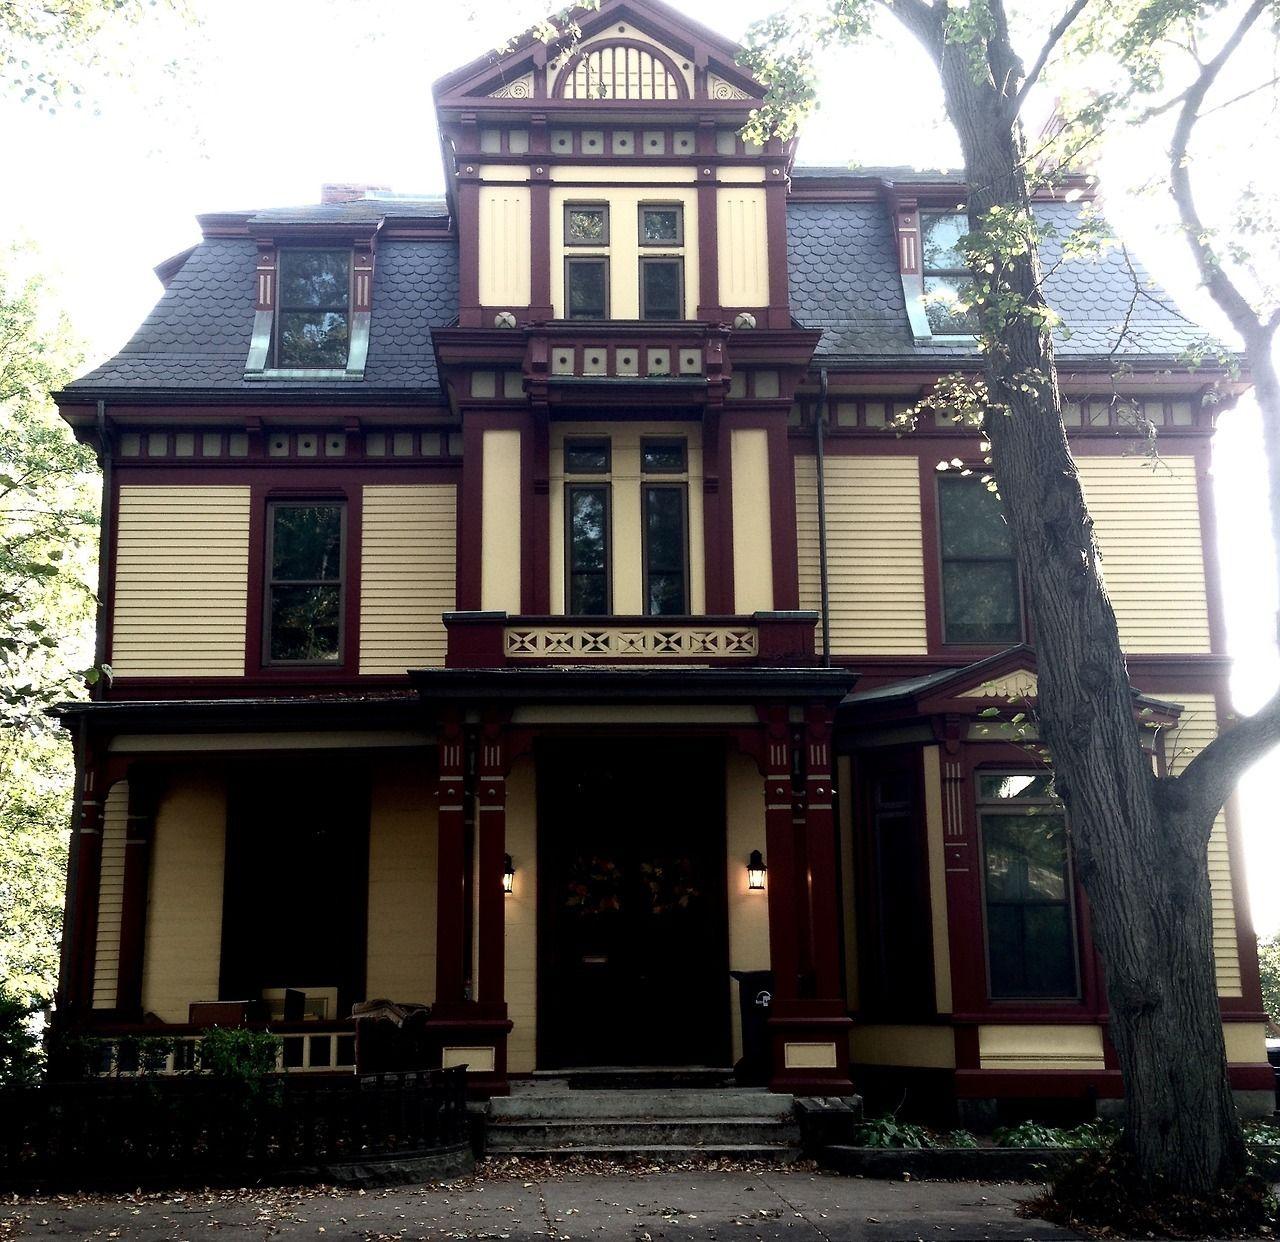 Sensational Rickinmar Thomas Park South Boston With Views Of Boston Home Interior And Landscaping Ologienasavecom